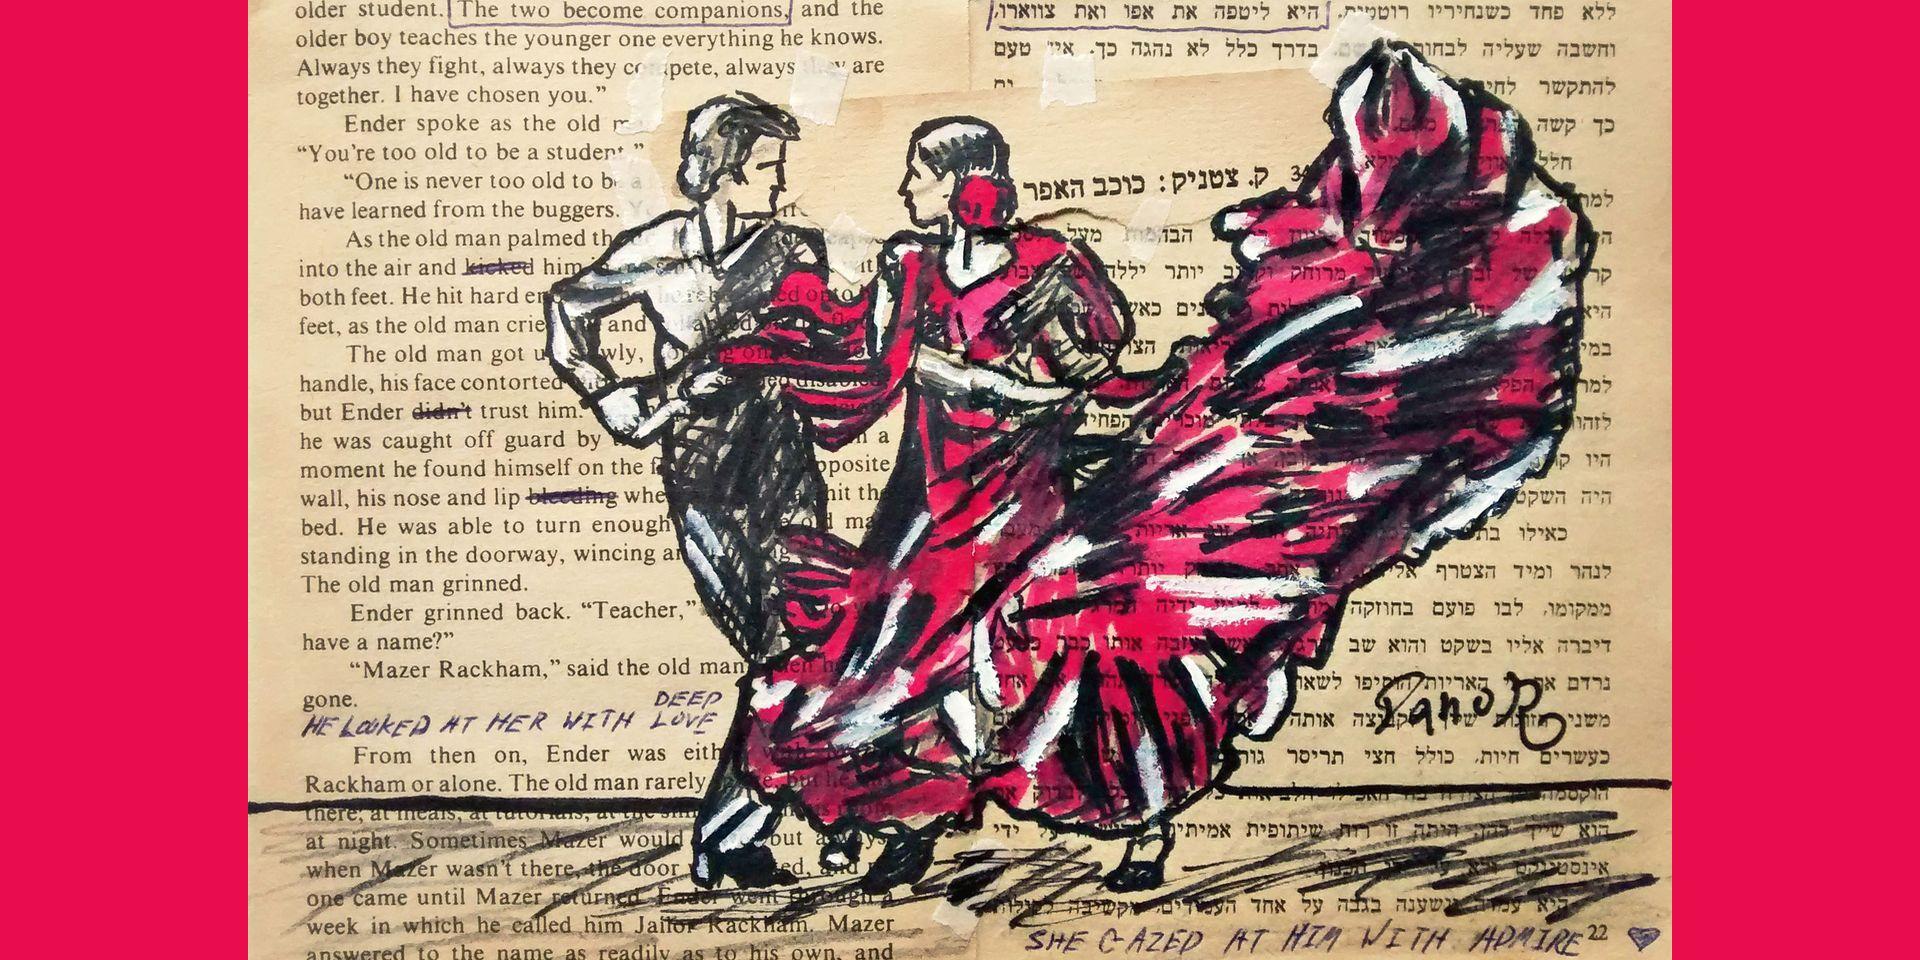 Flamenco Dances Pink - Danor Shtruzman (CC0)